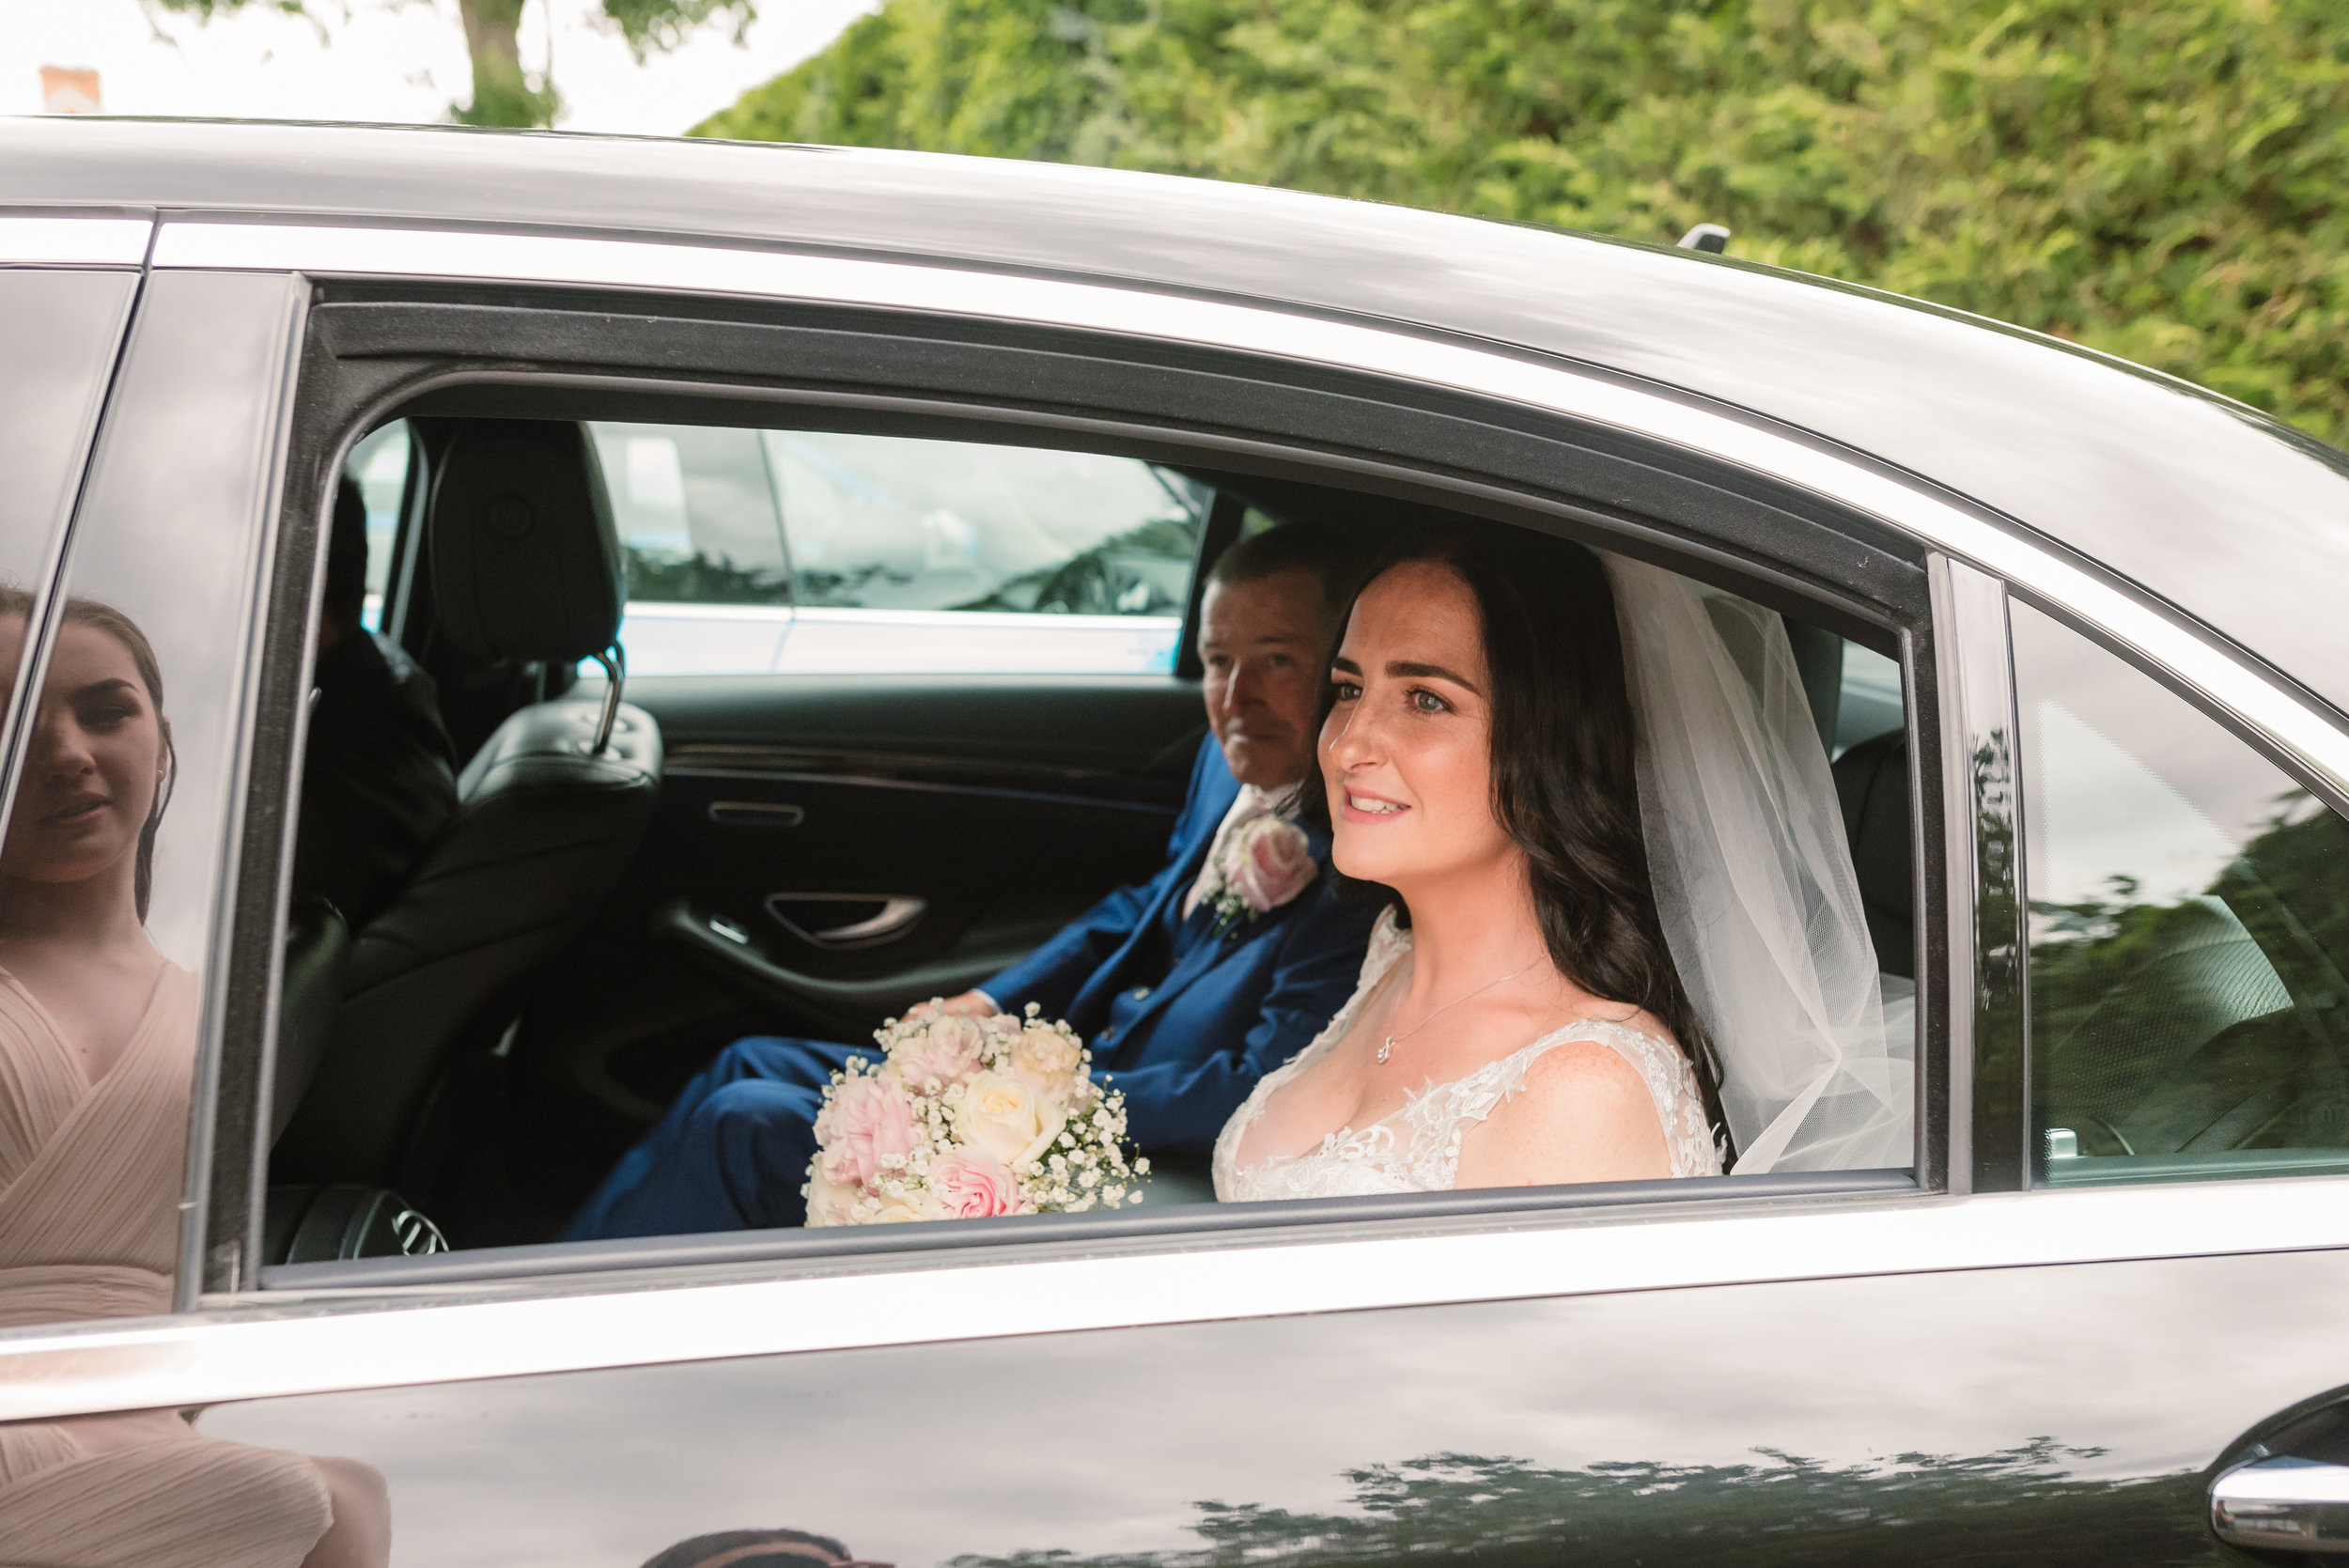 Sarah-Fishlock-Photography : Hampshire-wedding-photographer-hampshire : fleet-wedding-photographer-fleet : Meade-Hall-Wedding-Photographer : Meade-Hall-Wedding-Photos-405.jpg